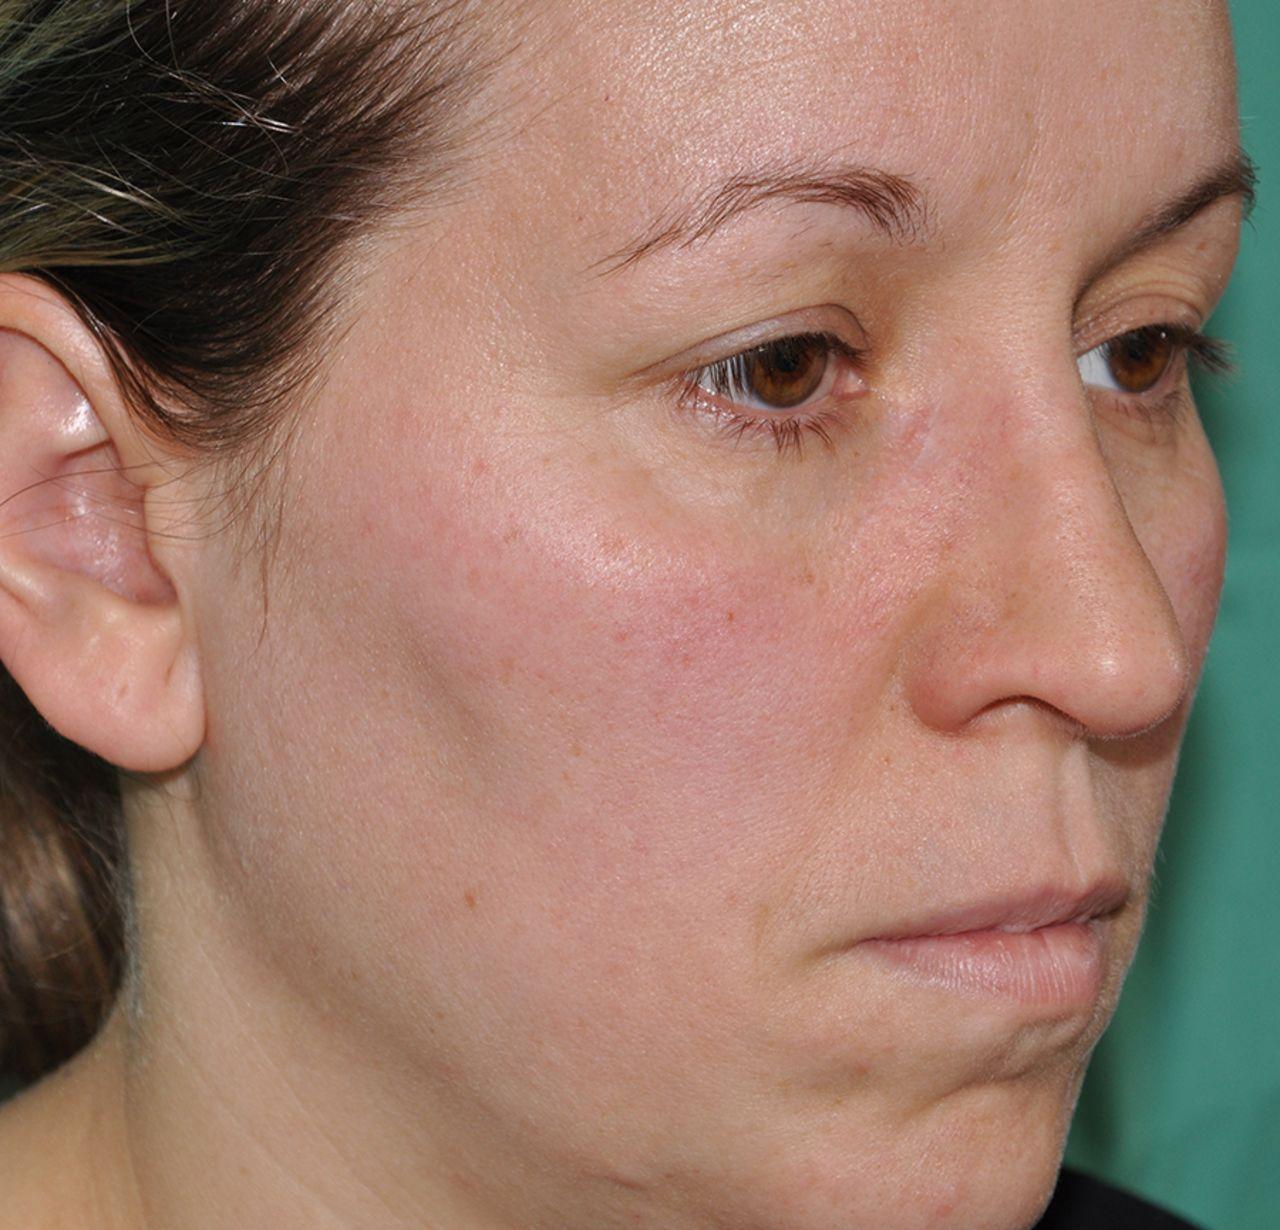 Subcutaneous sarcoidosis in a rhinoplasty scar | BMJ Case